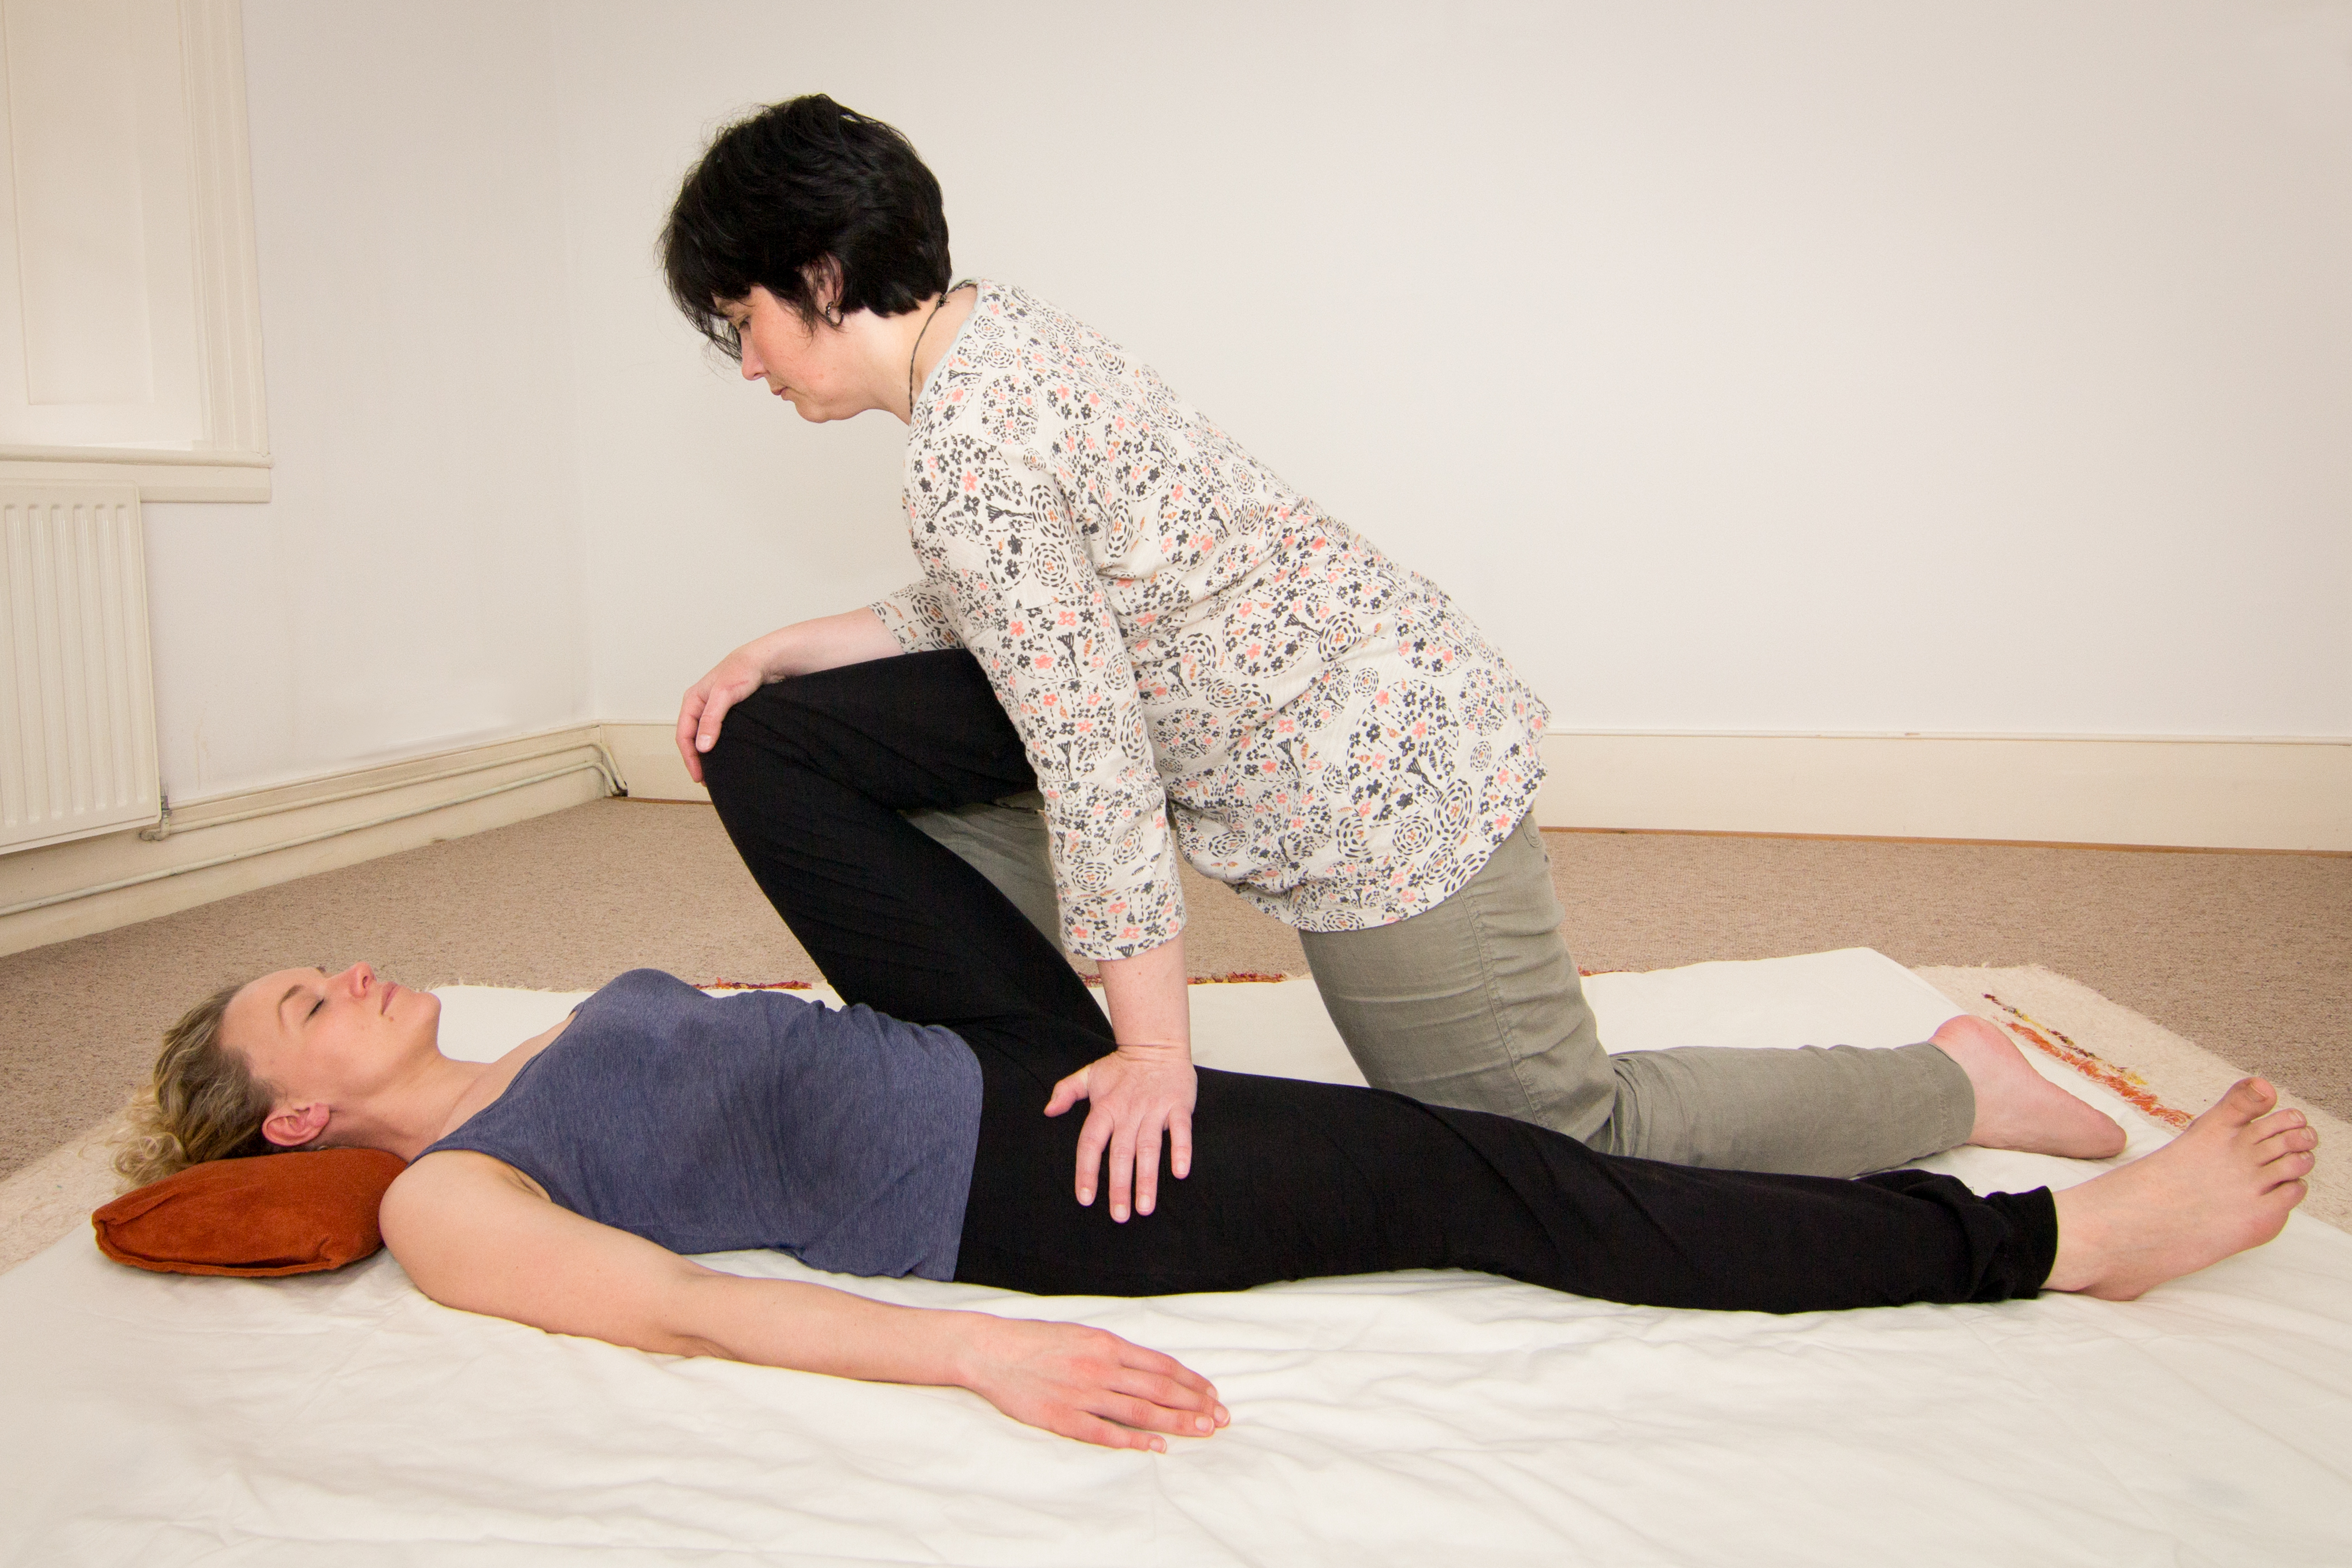 body to body massage nrw saft muschi